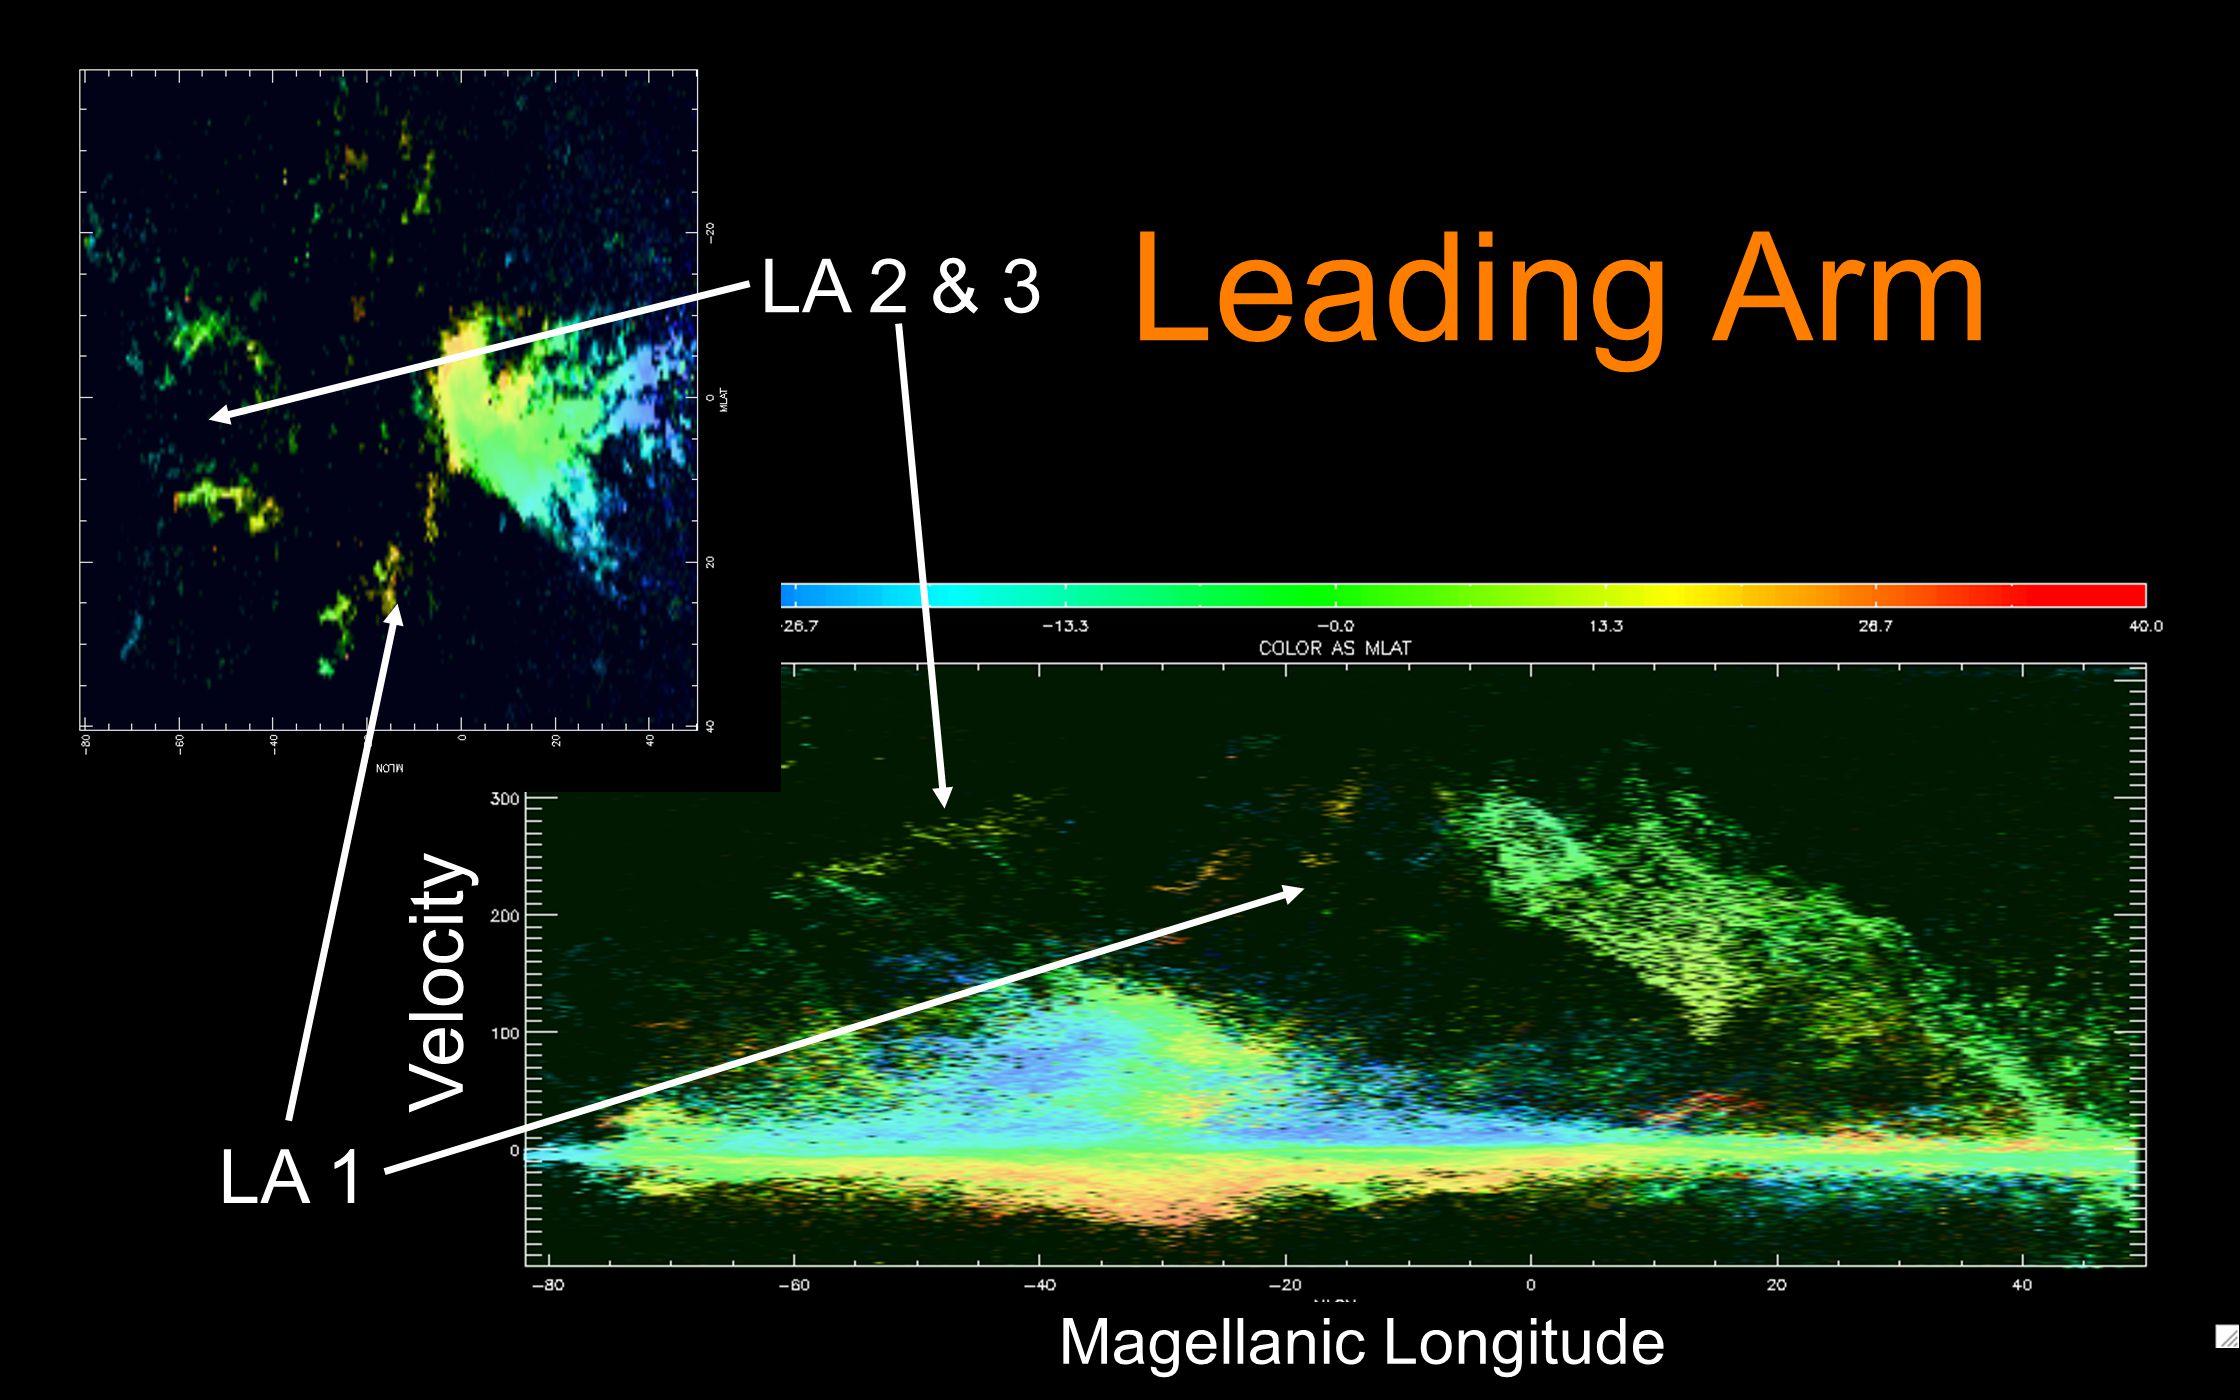 Leading Arm Magellanic Longitude Velocity LA 1 LA 2 & 3